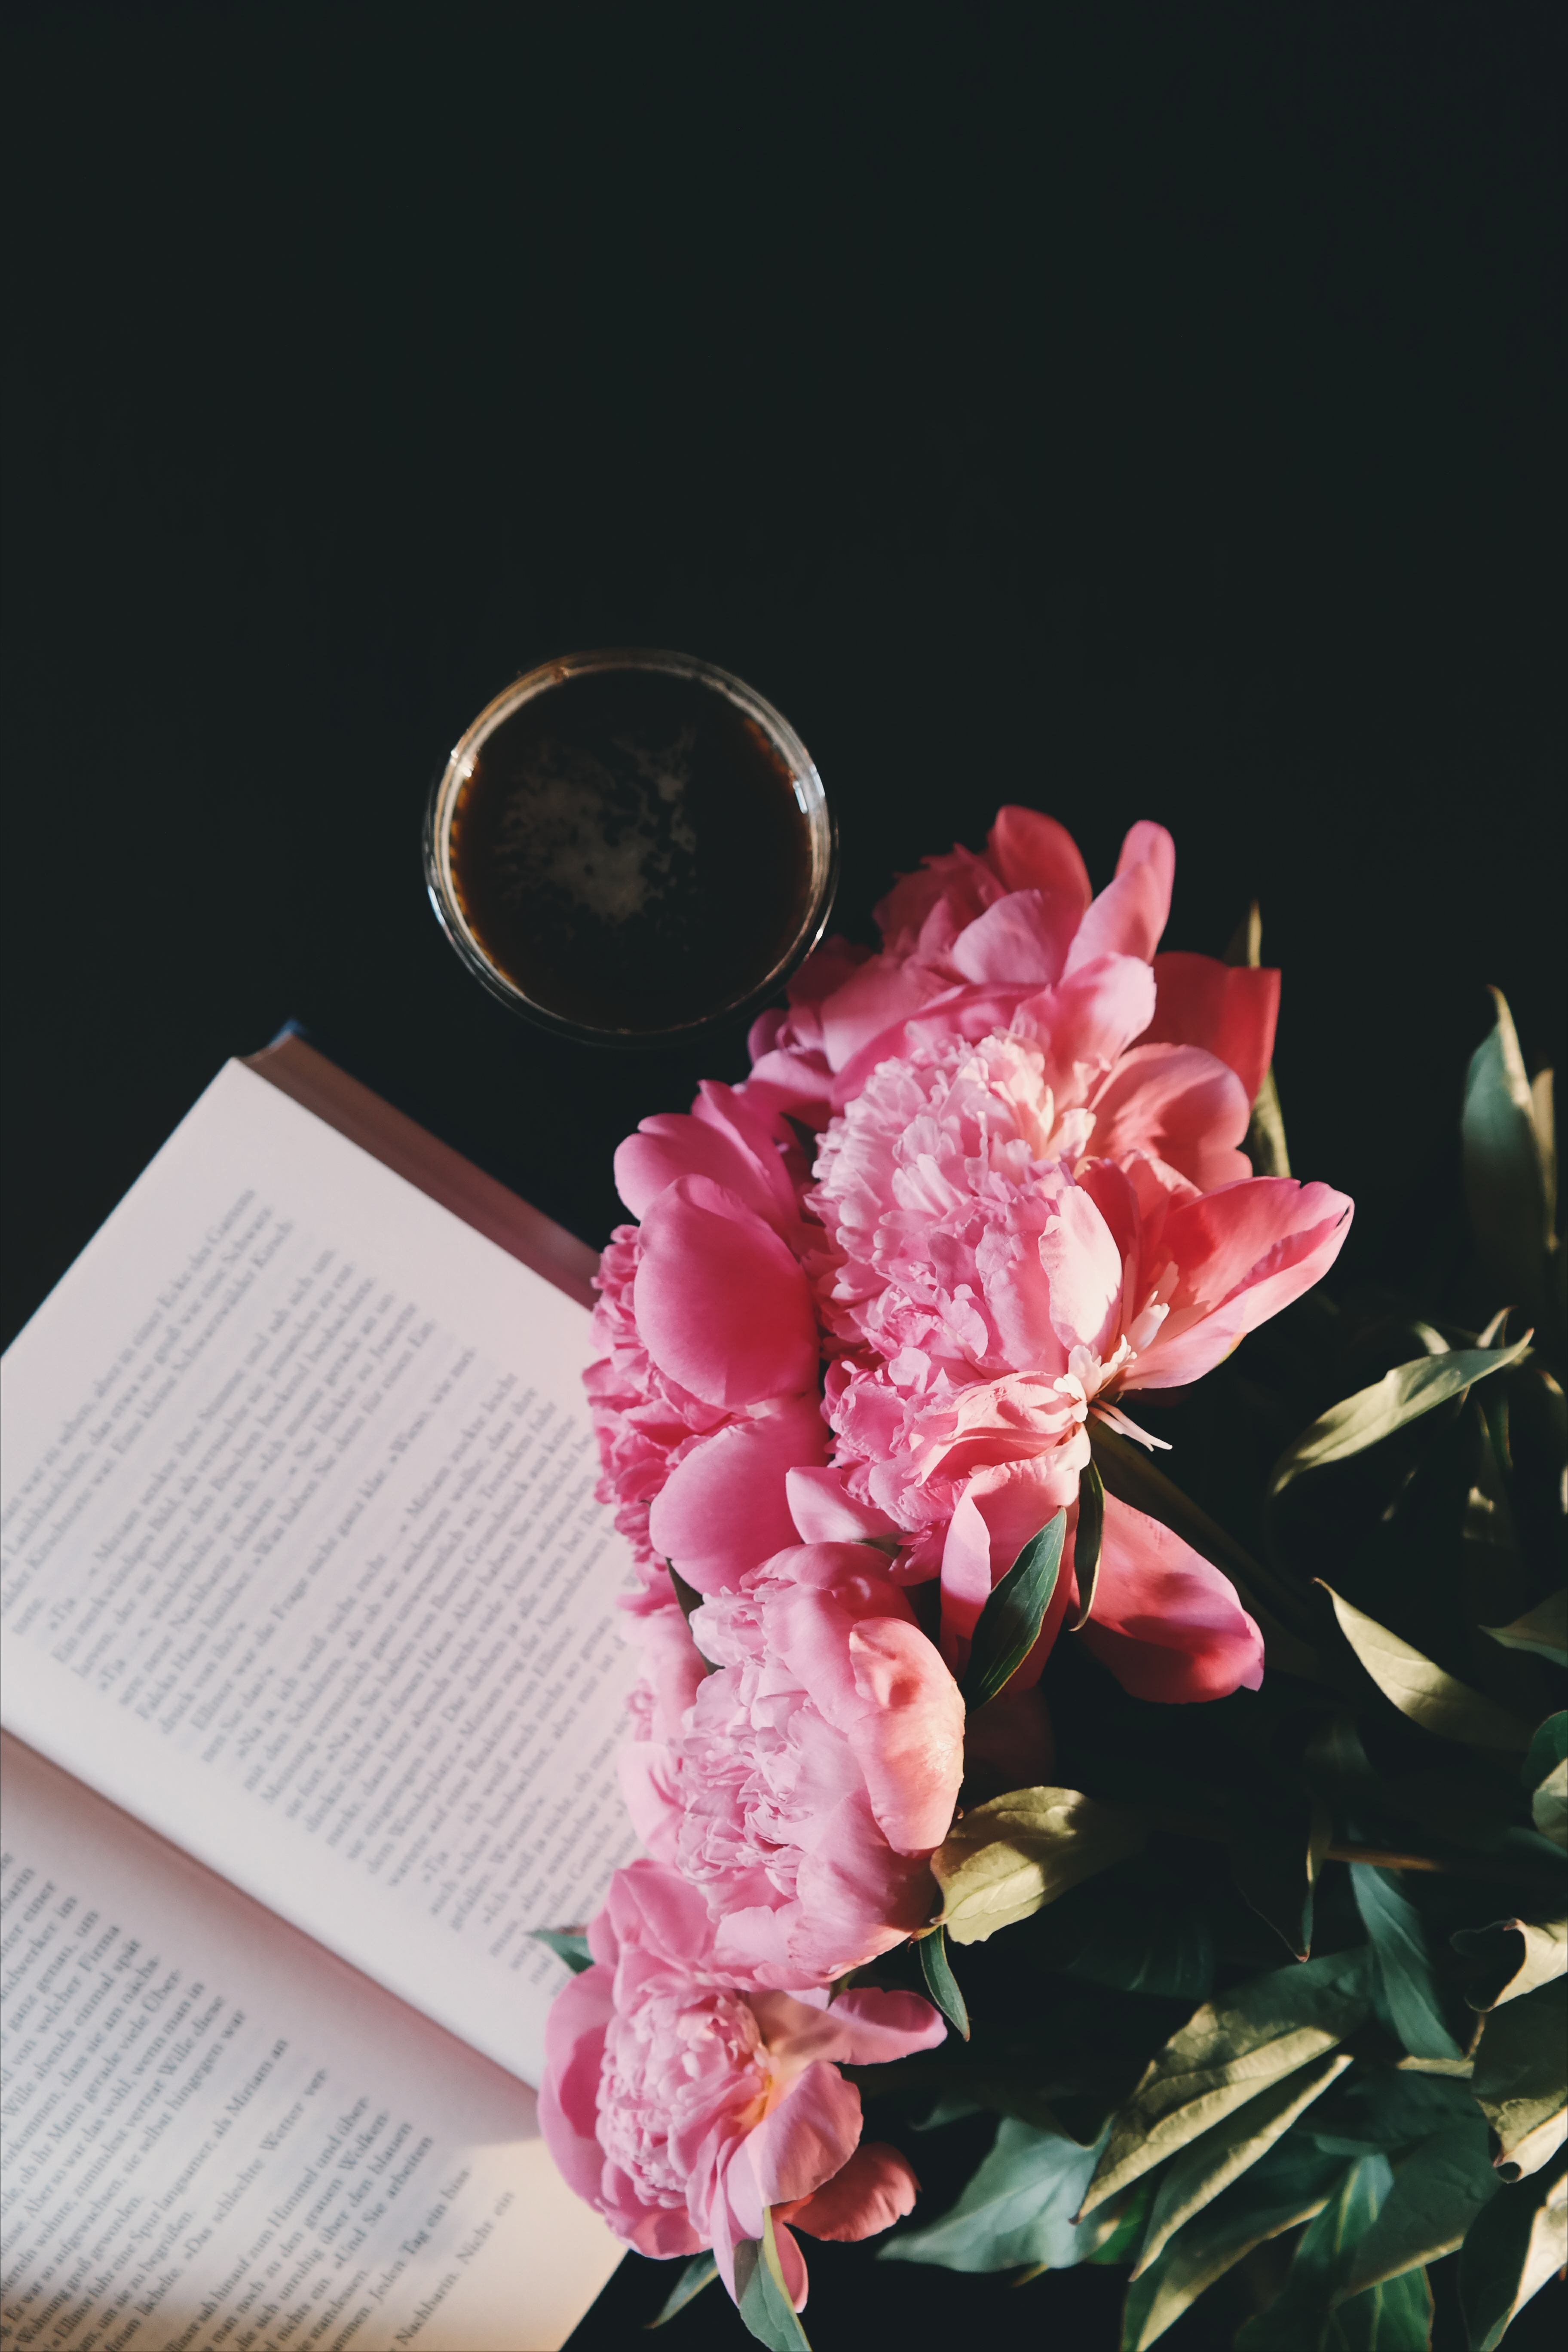 Pink Petaled Flowers Near Opened Book